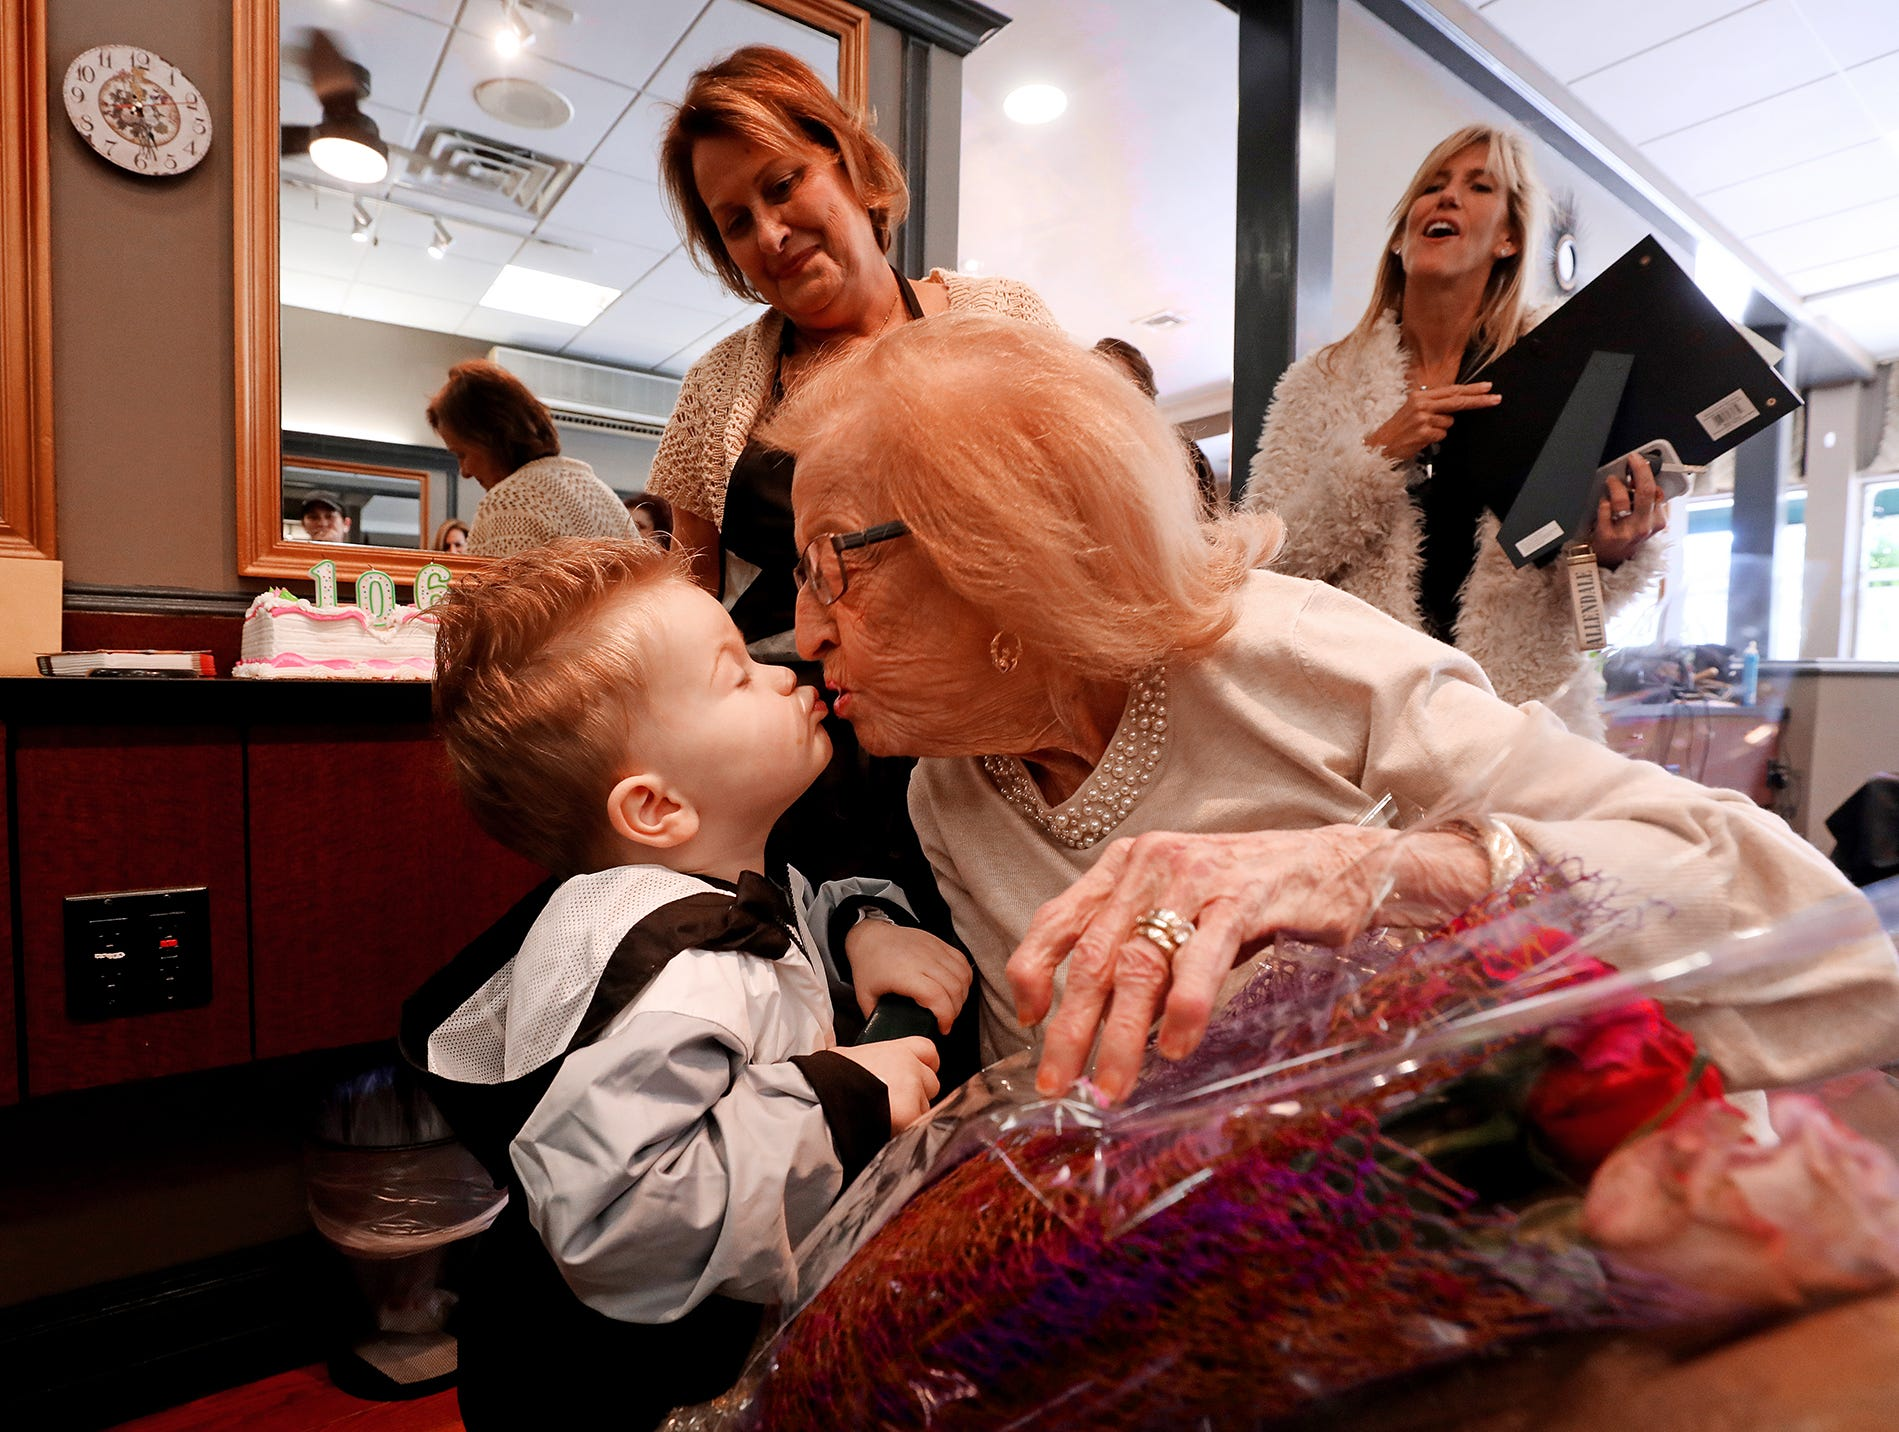 Brett Leo Devine 2 of Maywood kisses his great grandmother Susan Keane as part of her 106th birthday celebration.Pedota POY 2018